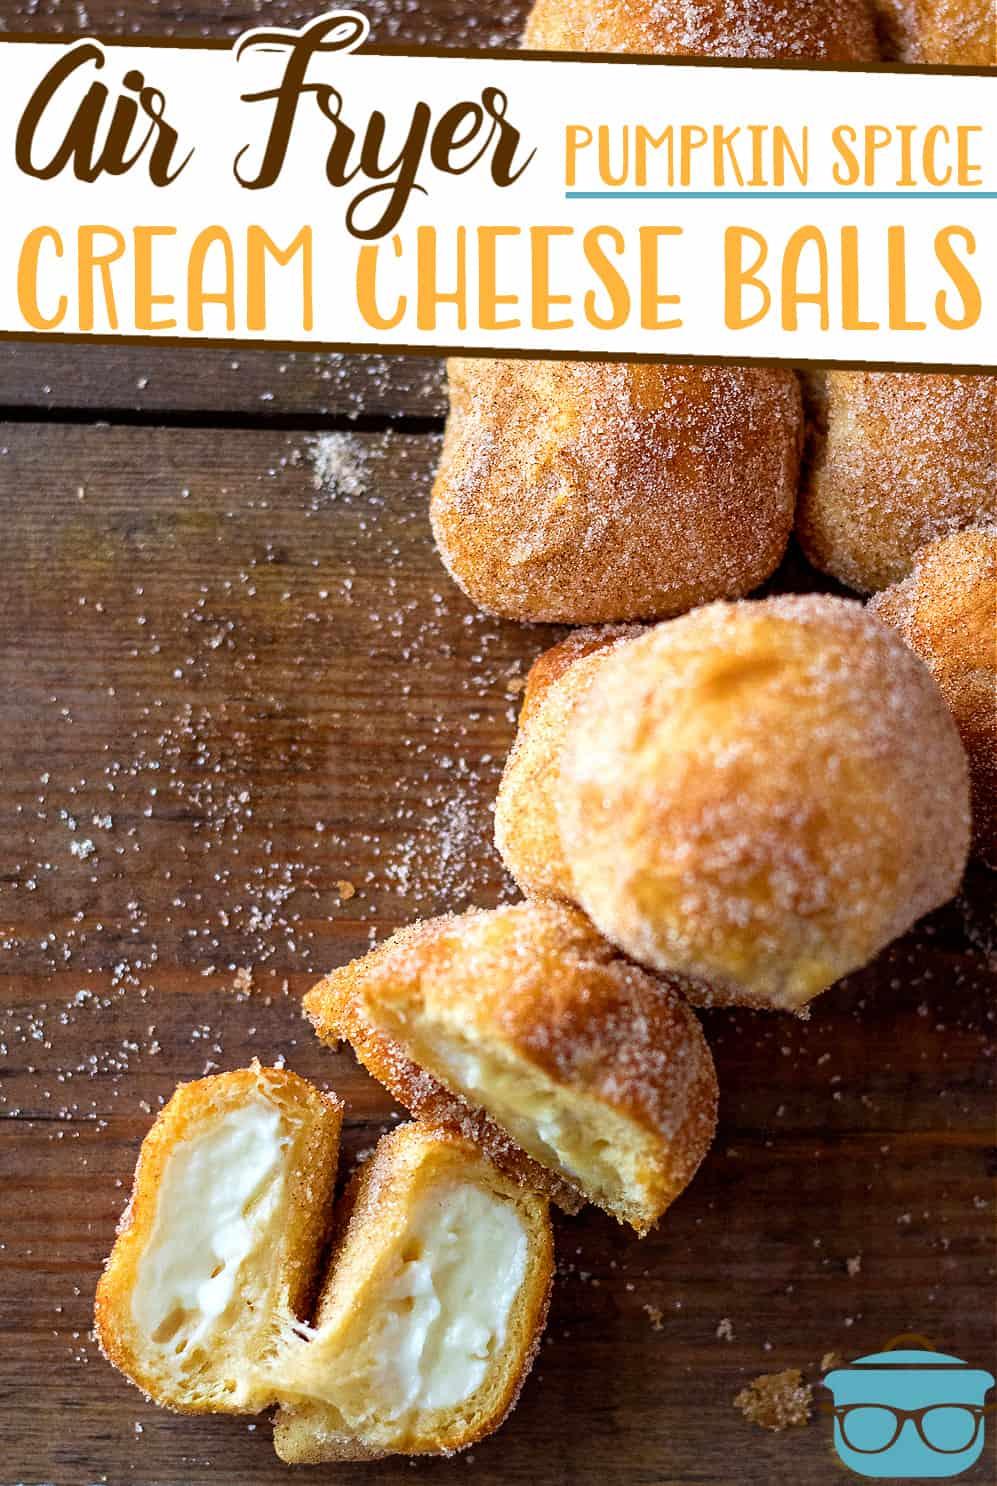 Air Fryer Pumpkin Spice Cream Cheese Bites is a fun and easy dessert recipe! Cream cheese wrapped dough balls rolled in spiced sugar!